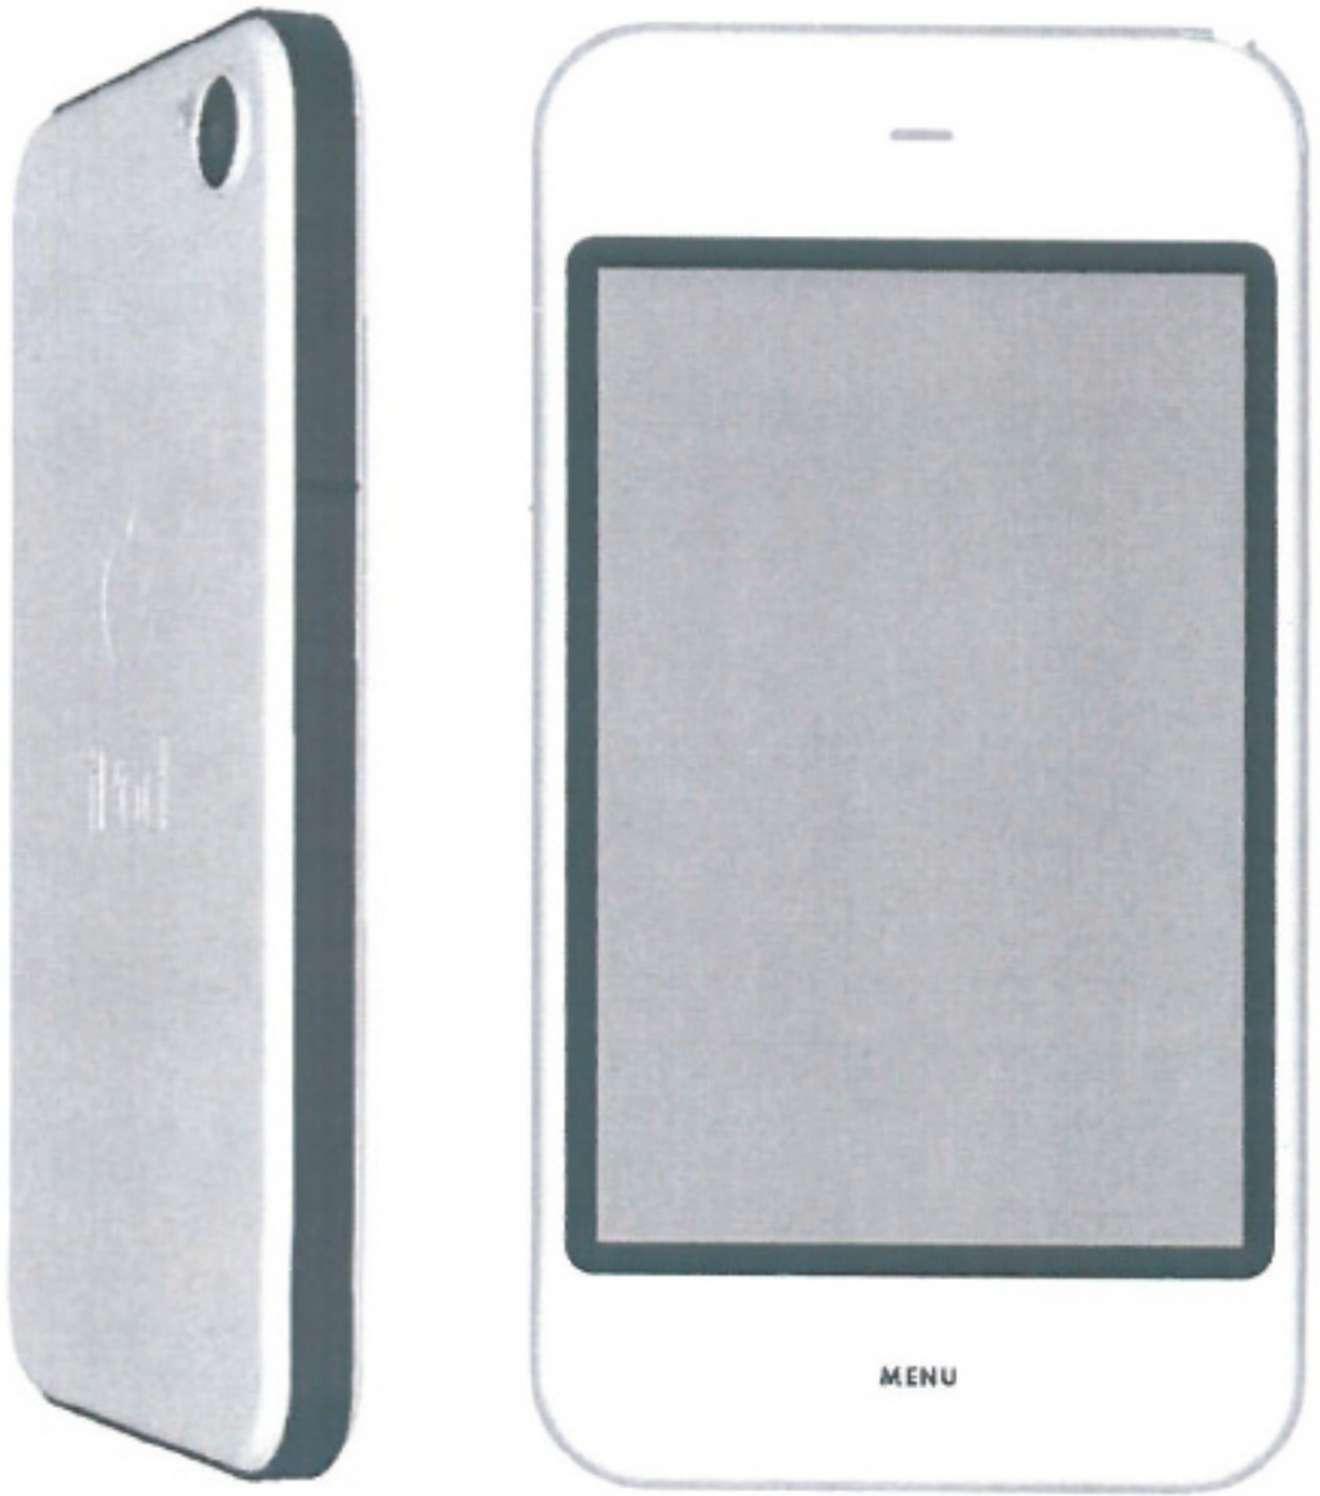 Прототип Айфона (62.21КБ)